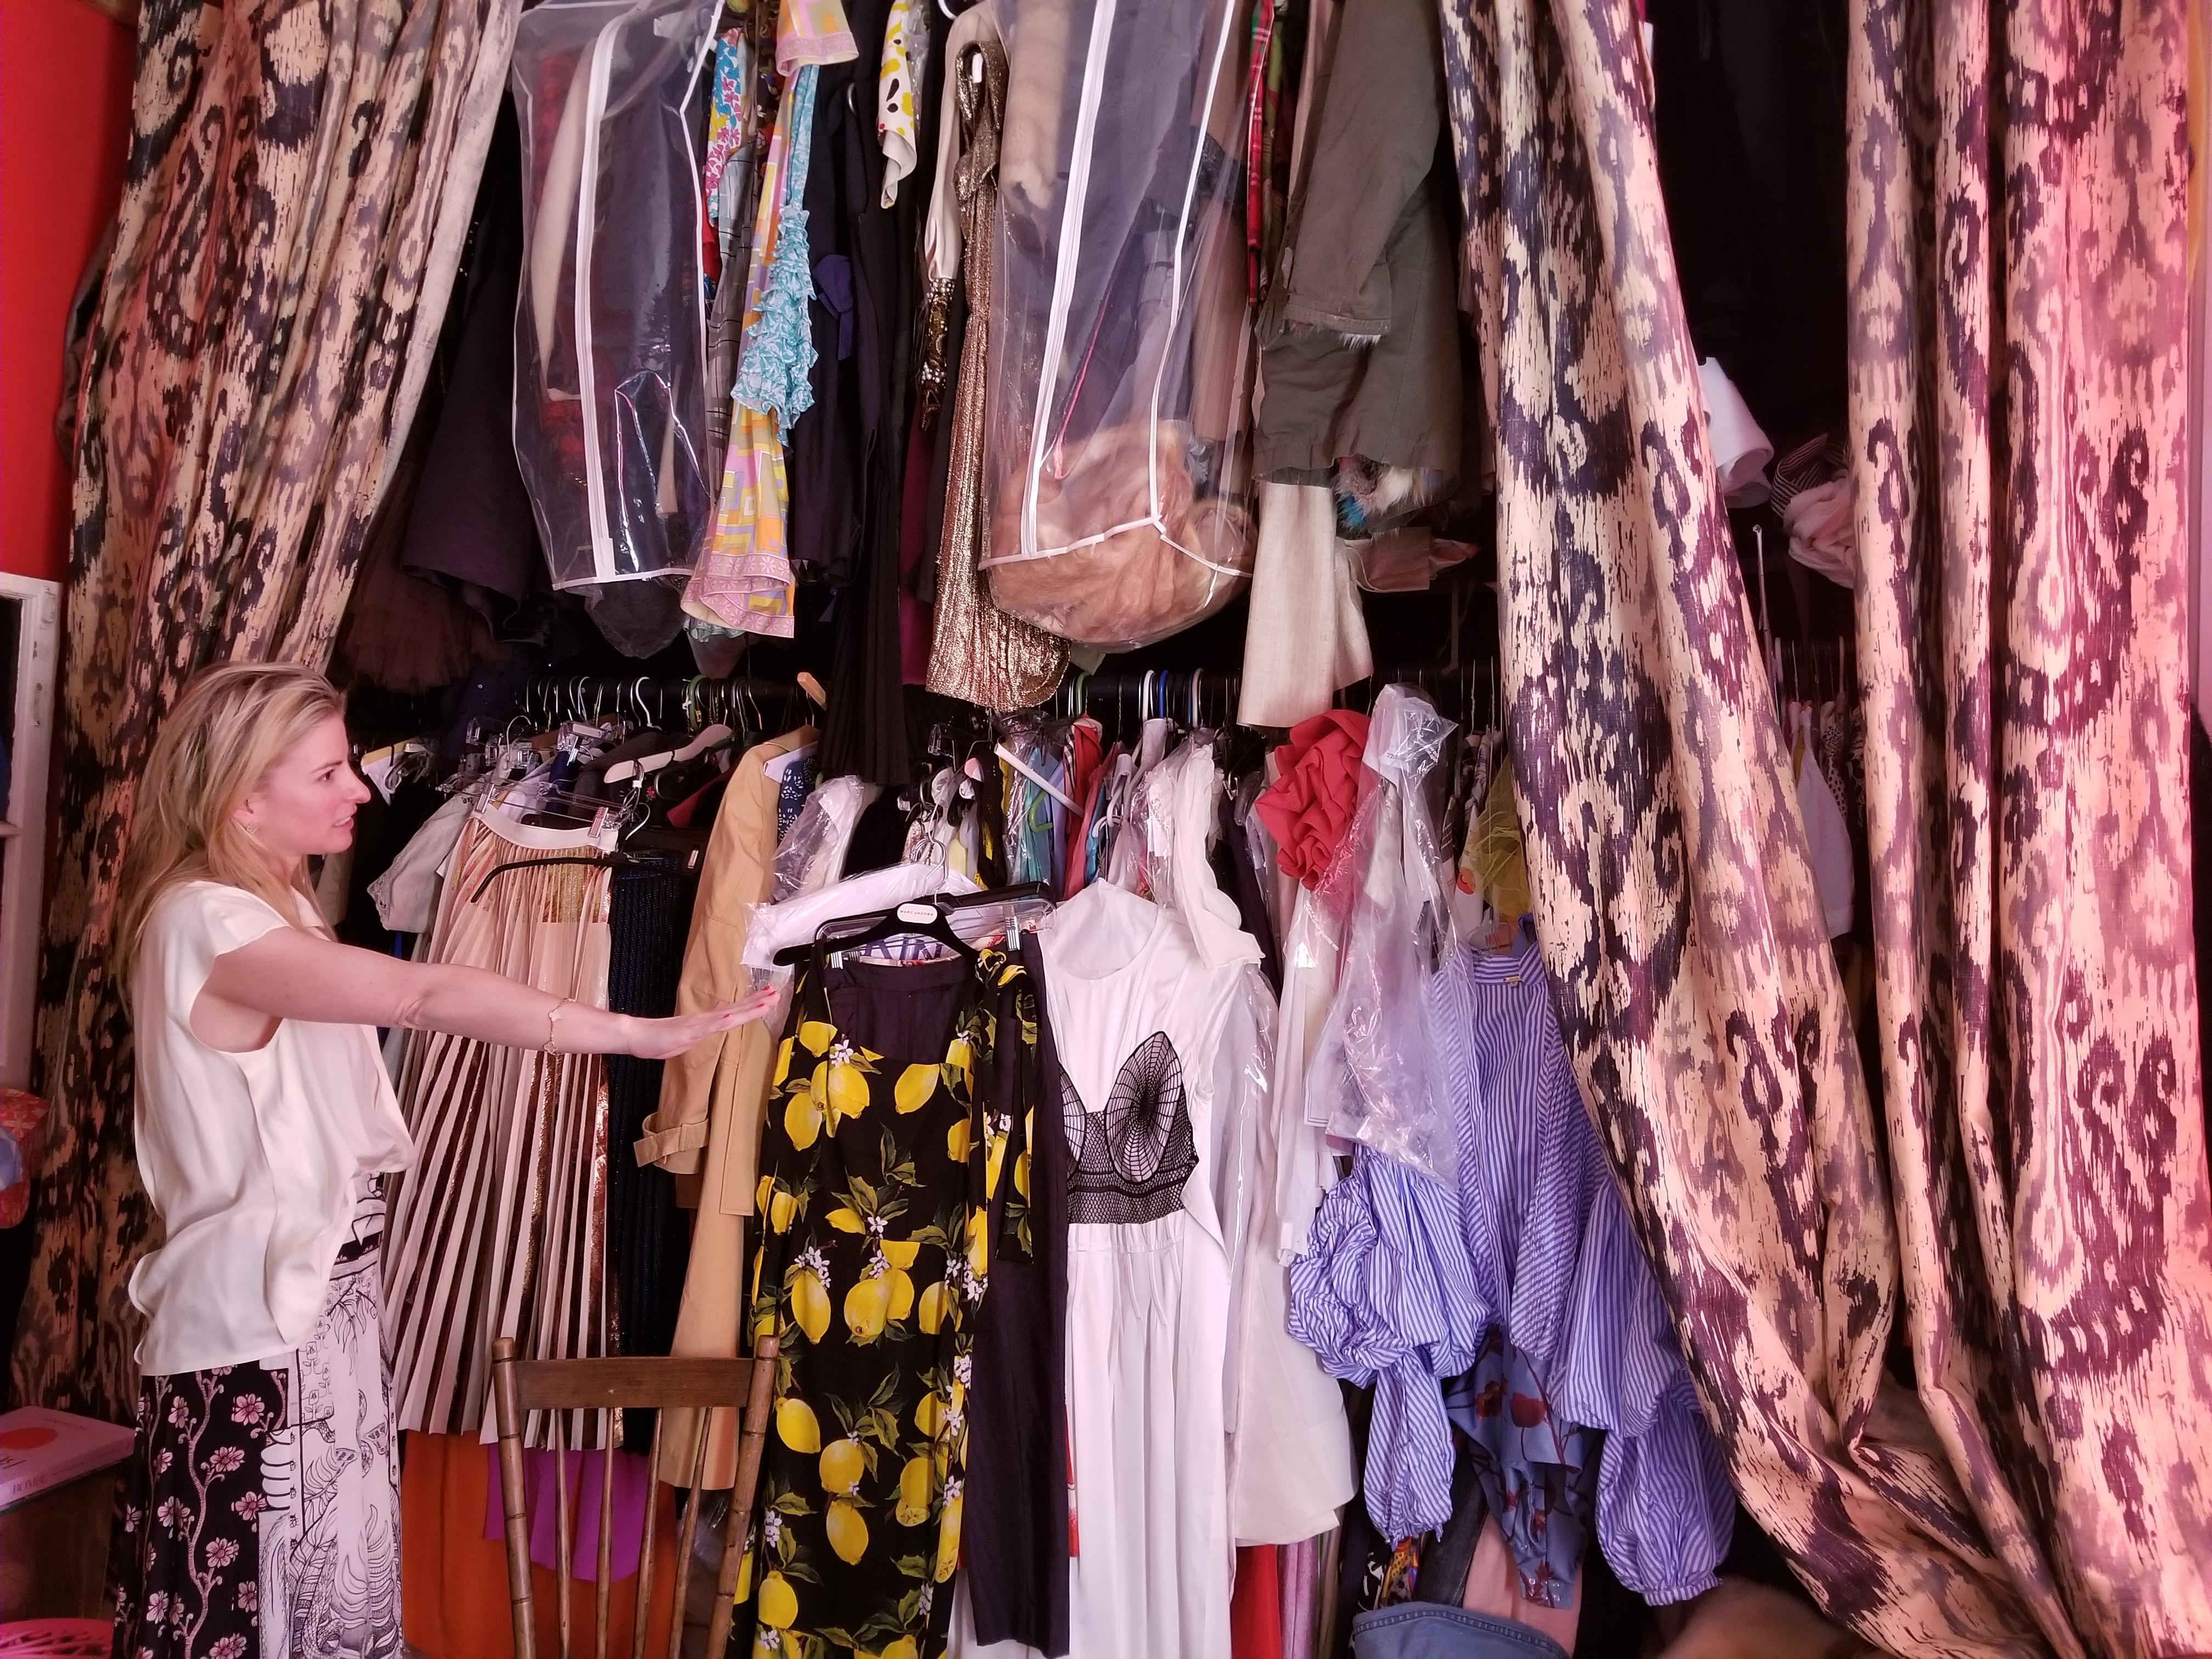 Whitney Closet